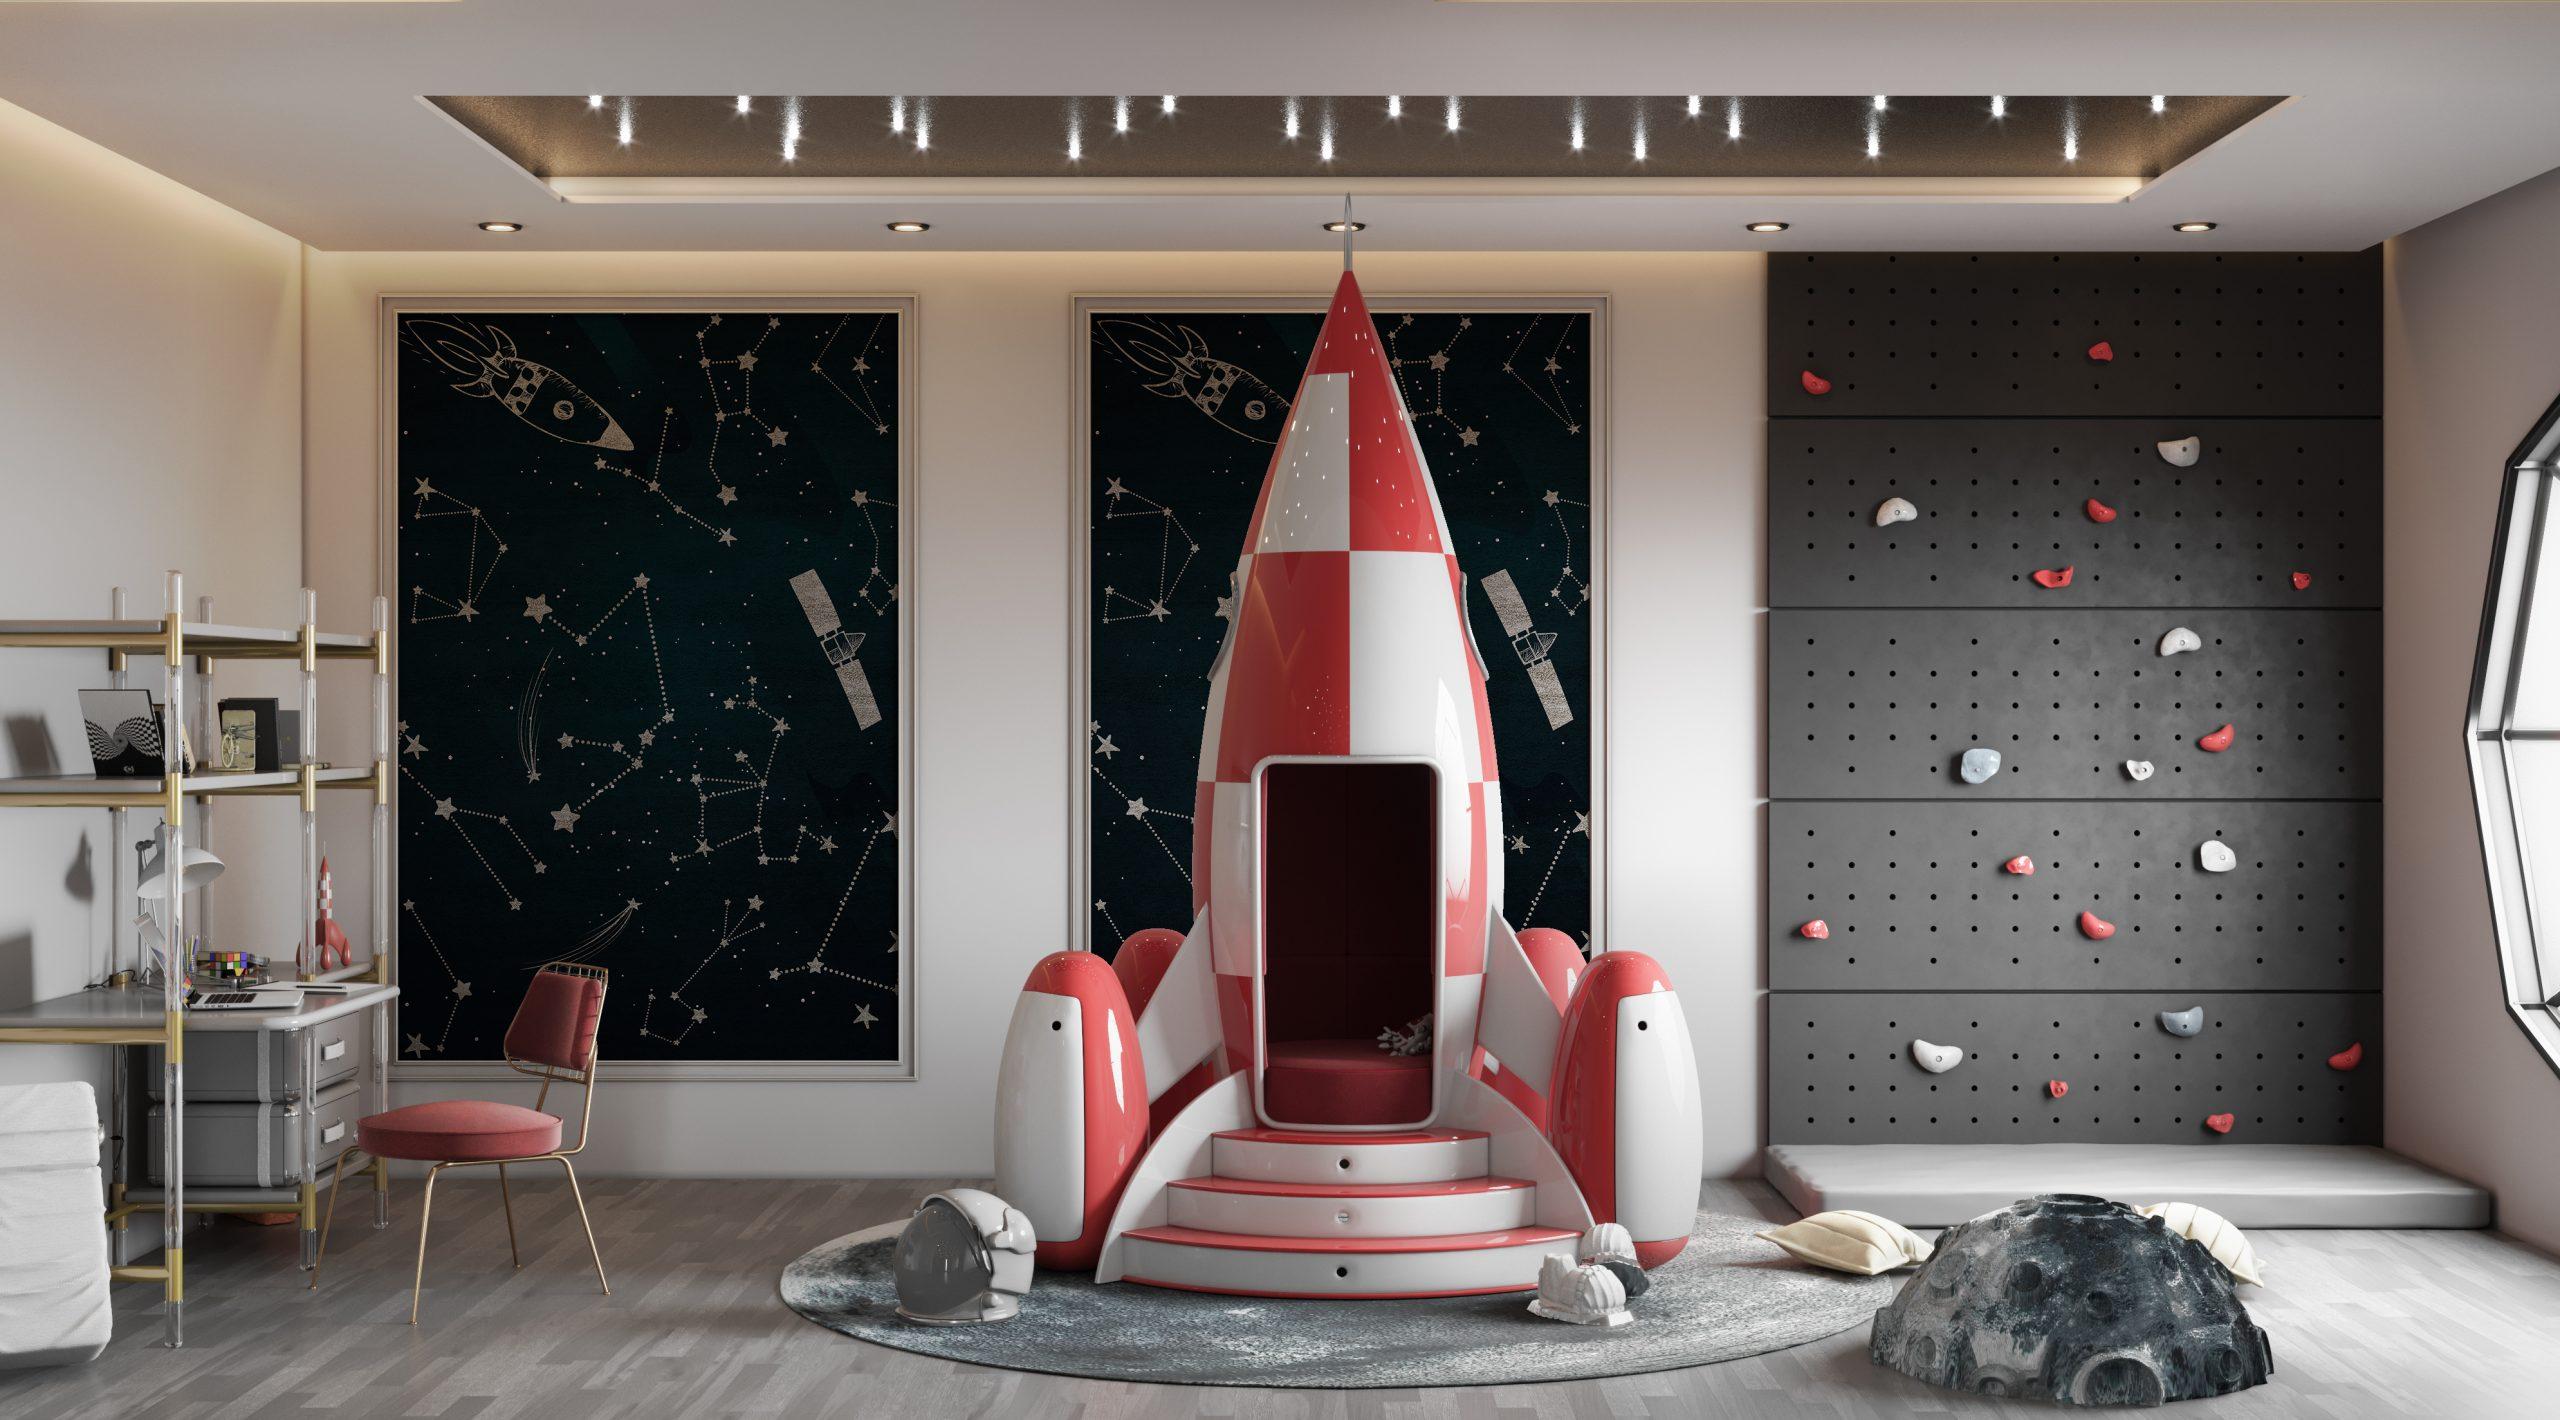 Luxury Space Theme Kids Room and playroom